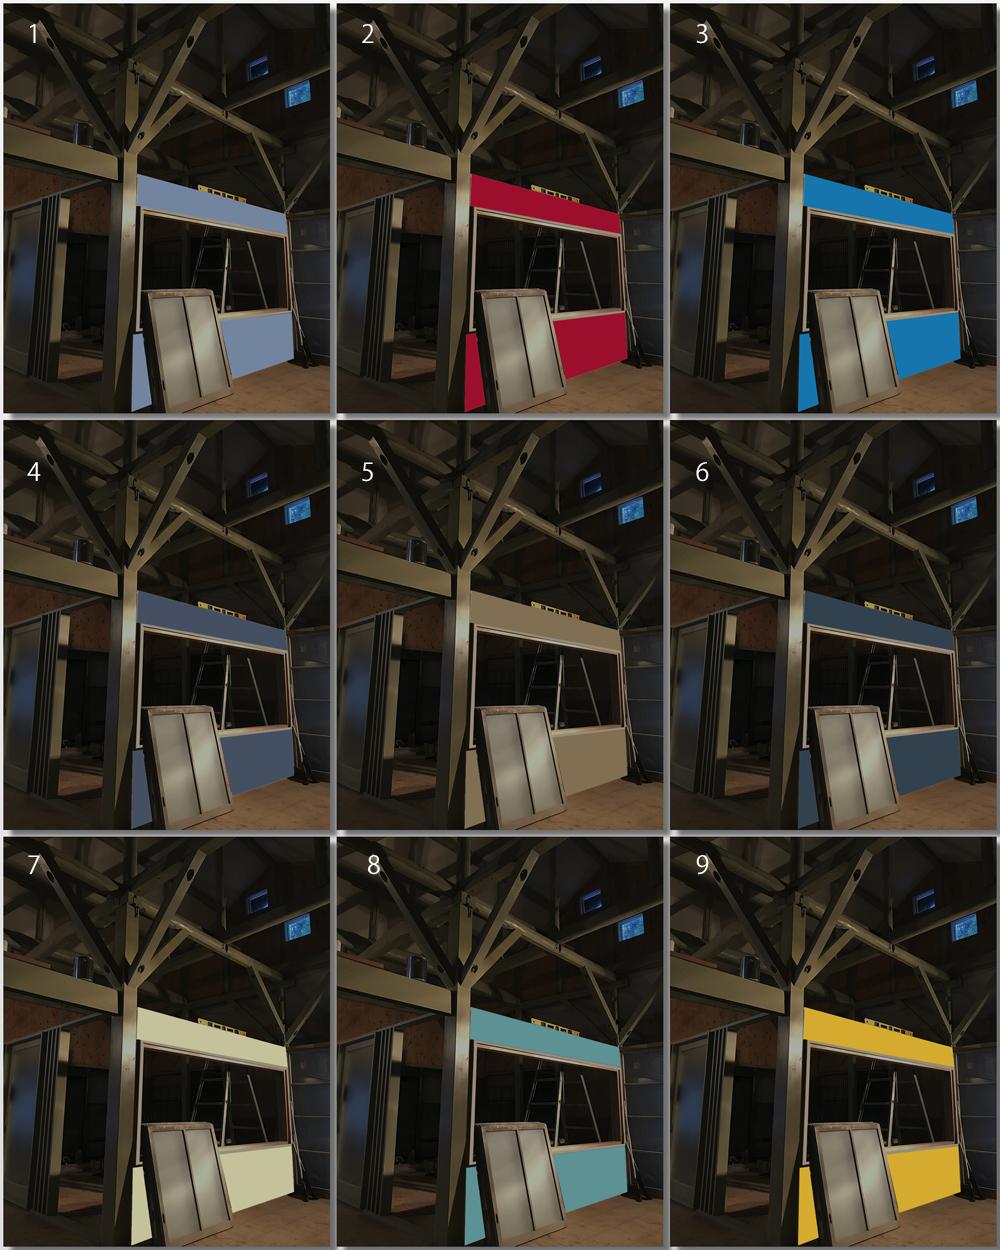 coloursimulation.jpg